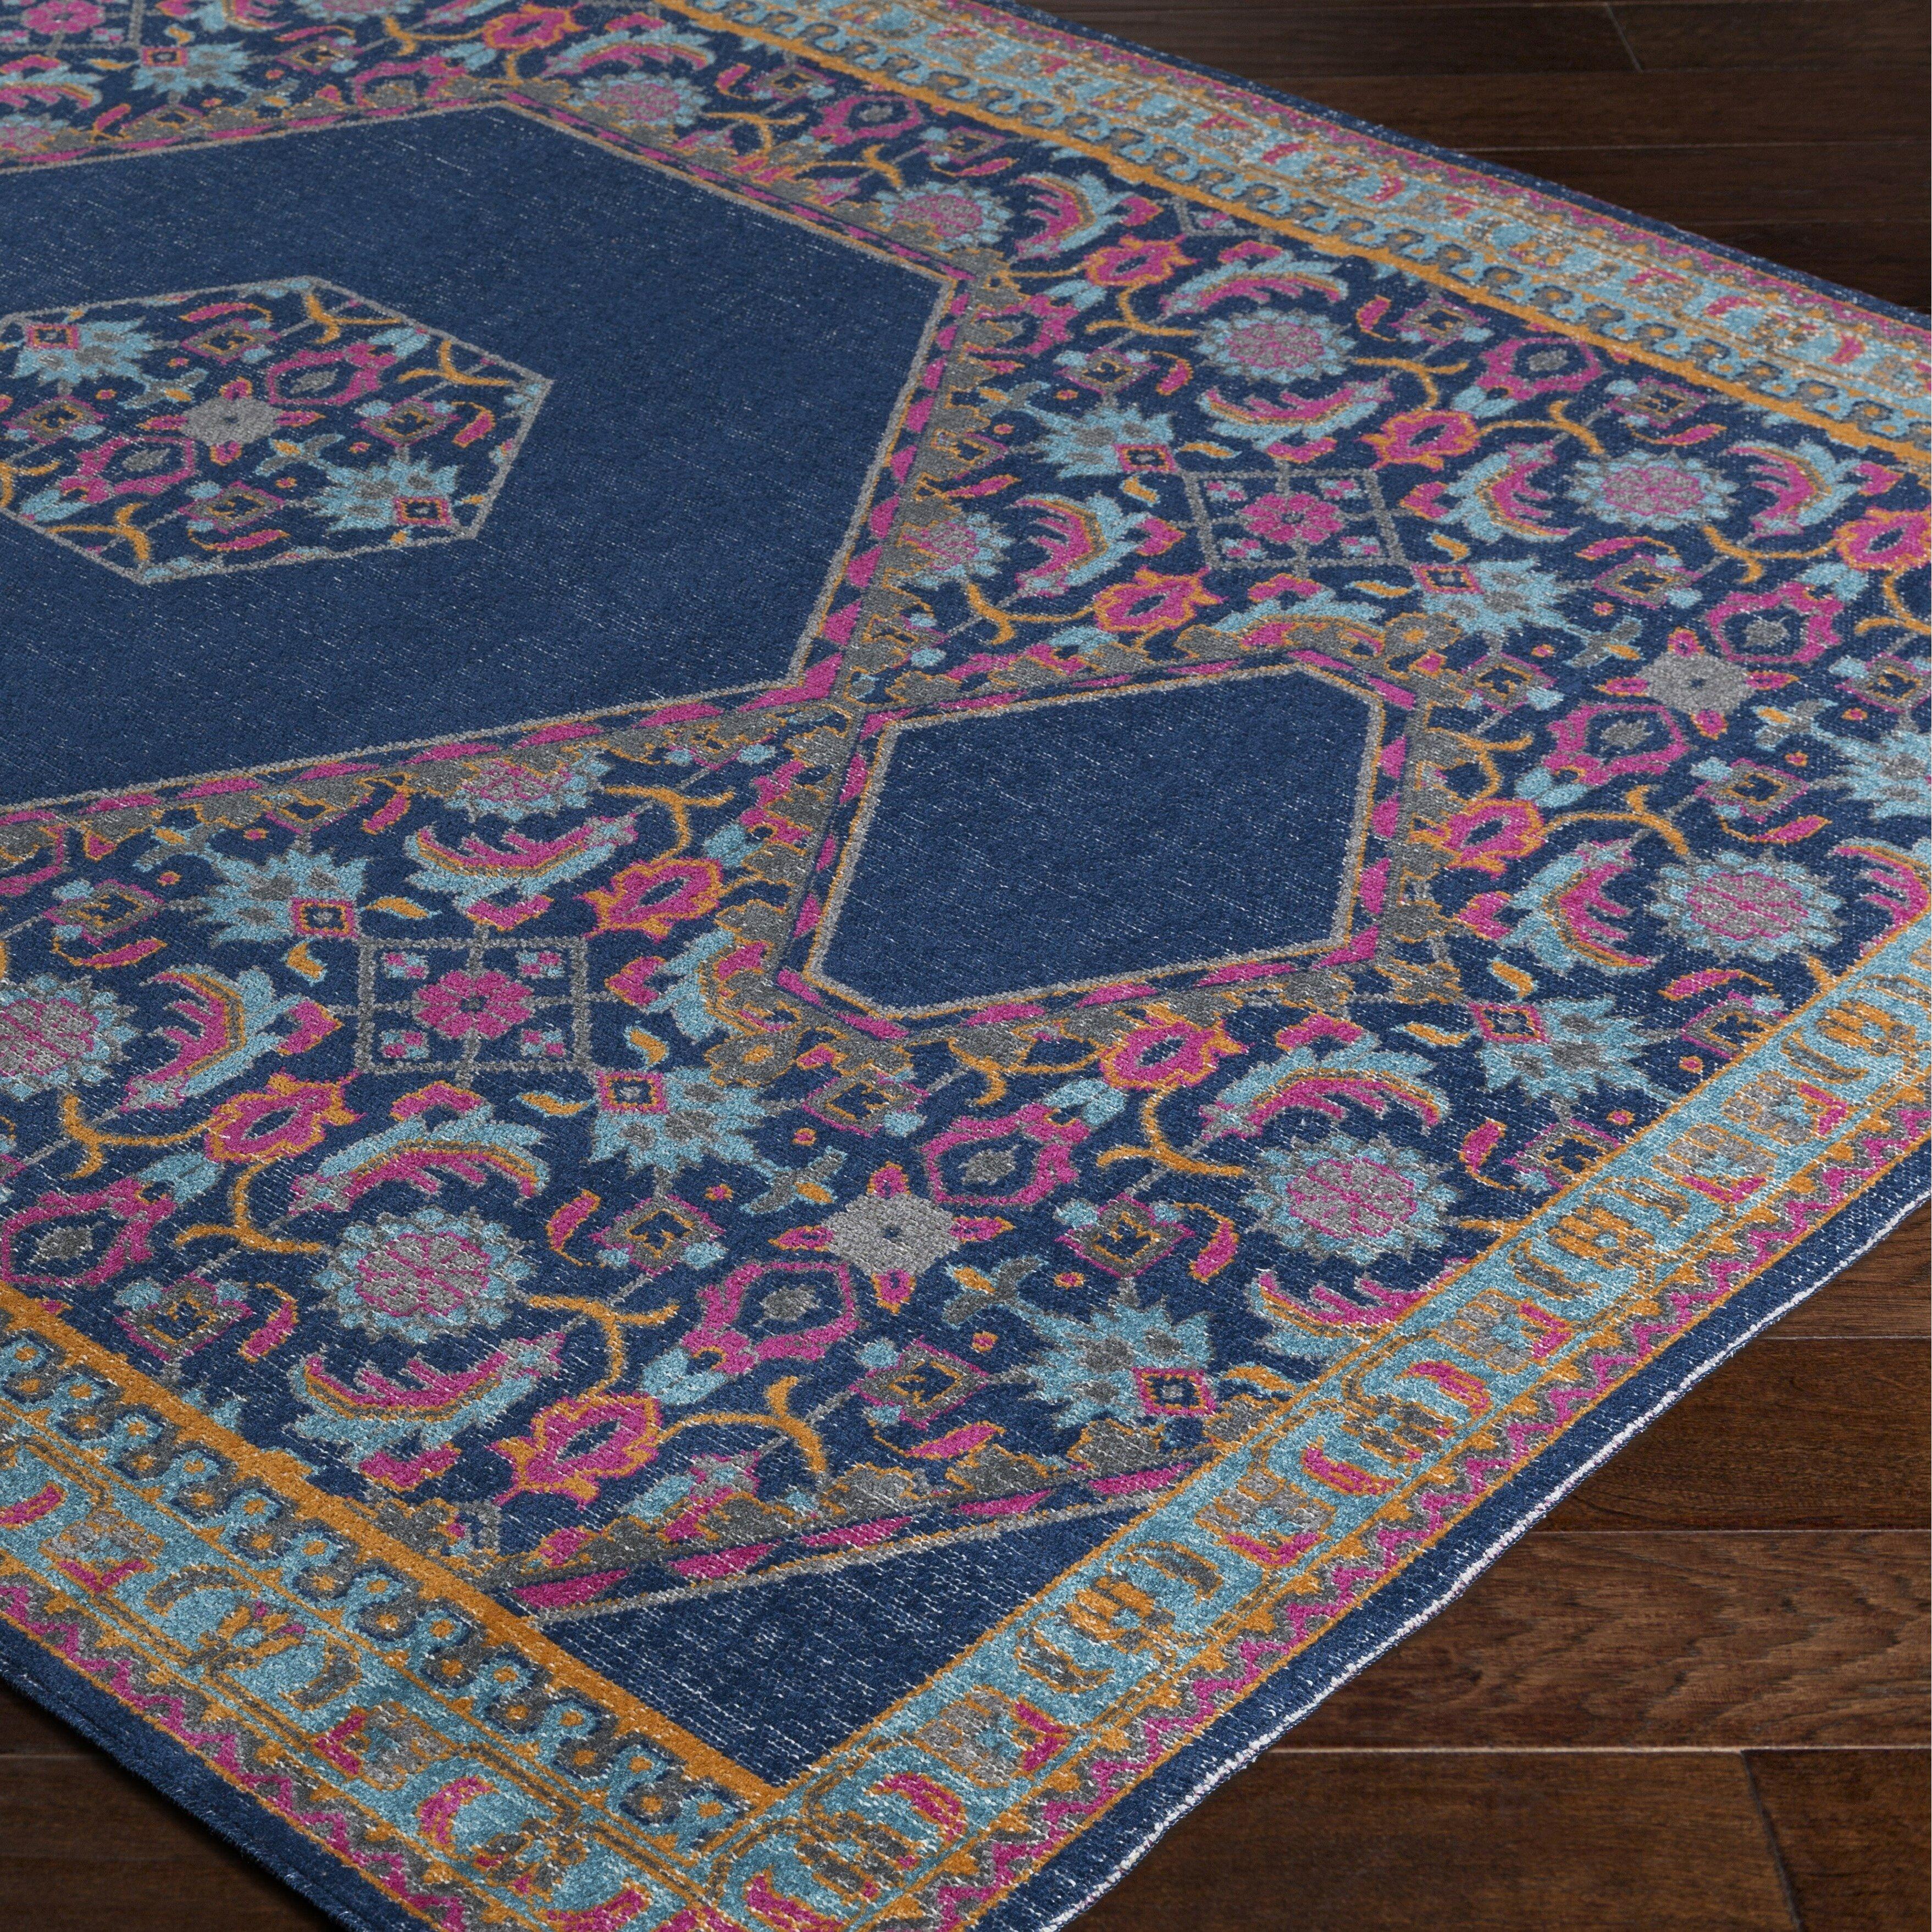 bungalow rose randhir blue pink area rug reviews wayfair. Black Bedroom Furniture Sets. Home Design Ideas